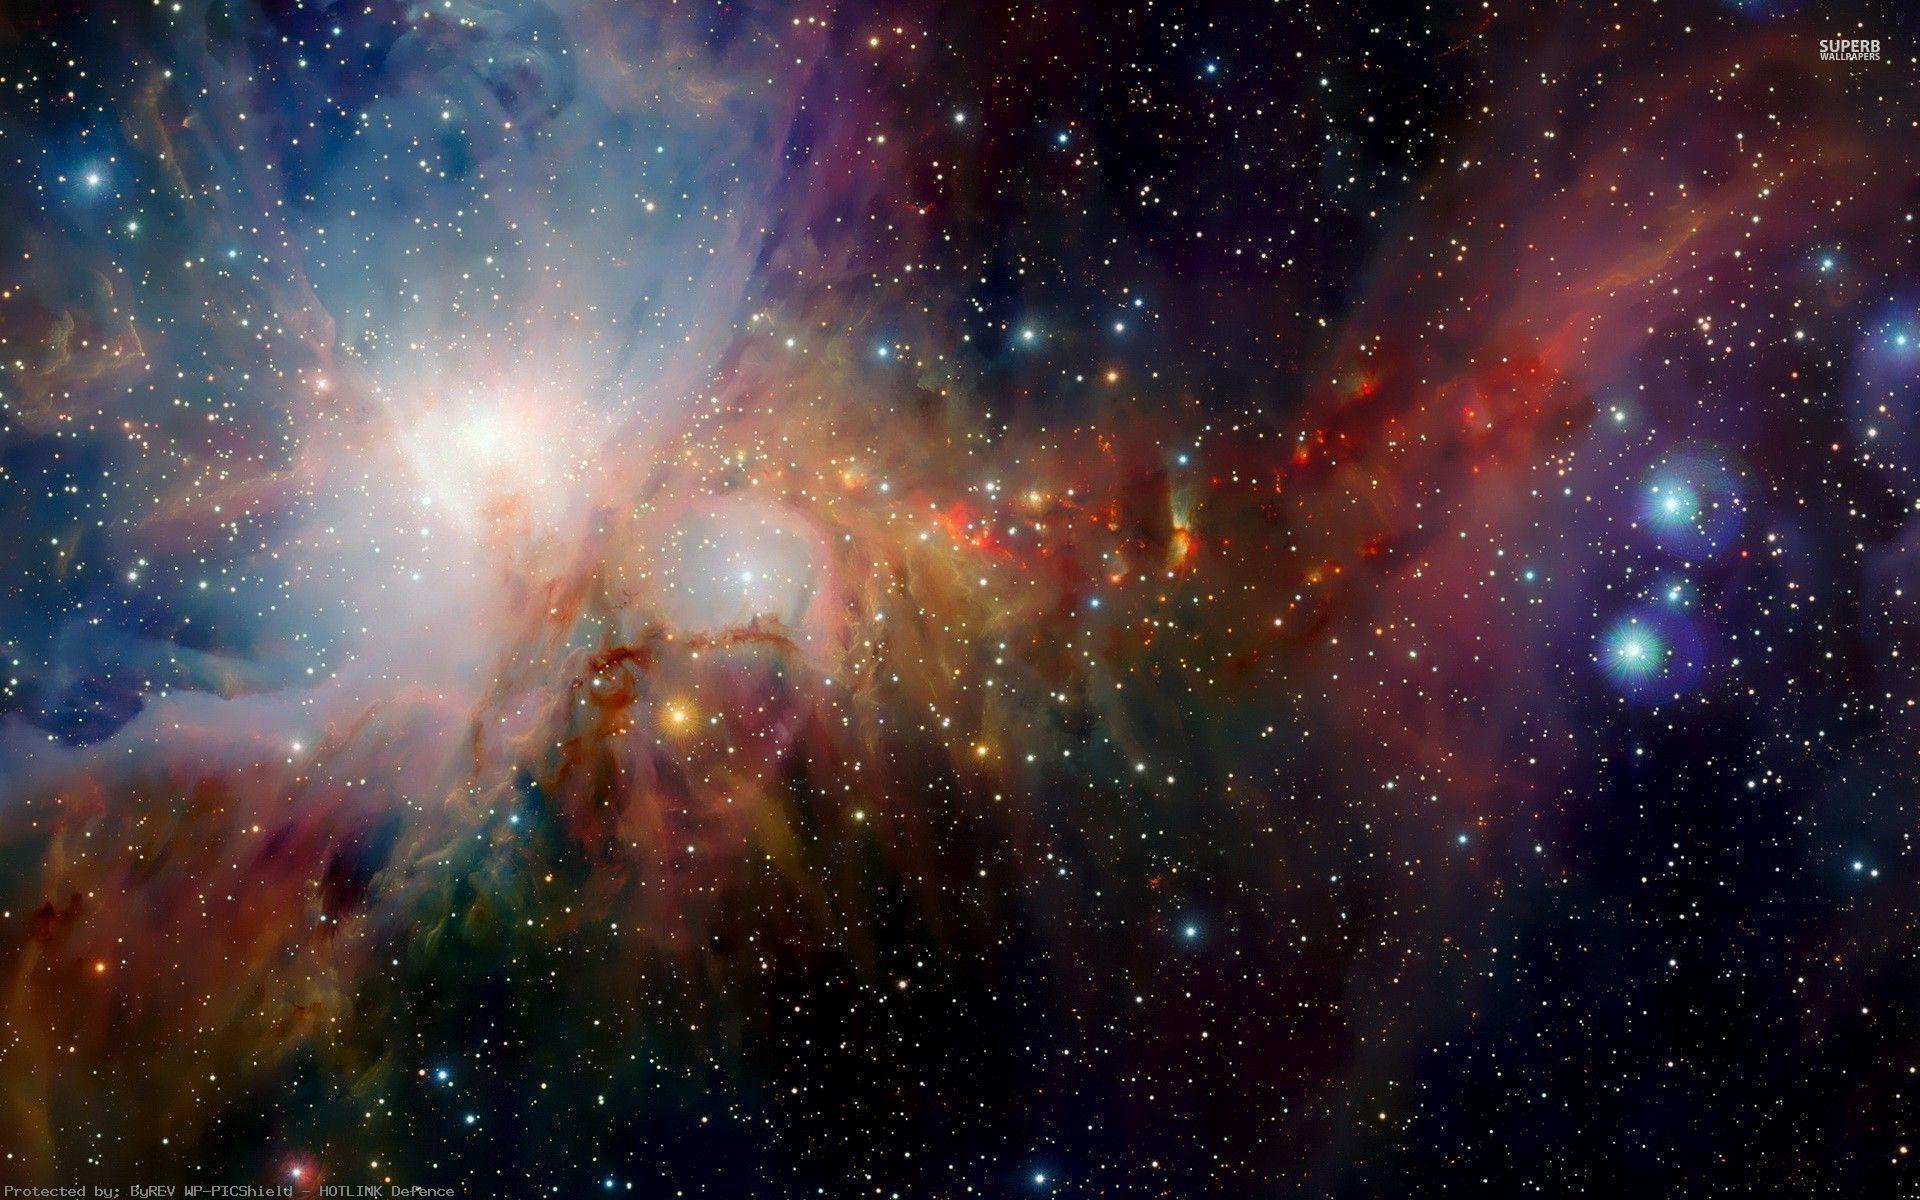 Nebula-Computer-Desktop-Backgrounds-ID-1920%C3%971080-